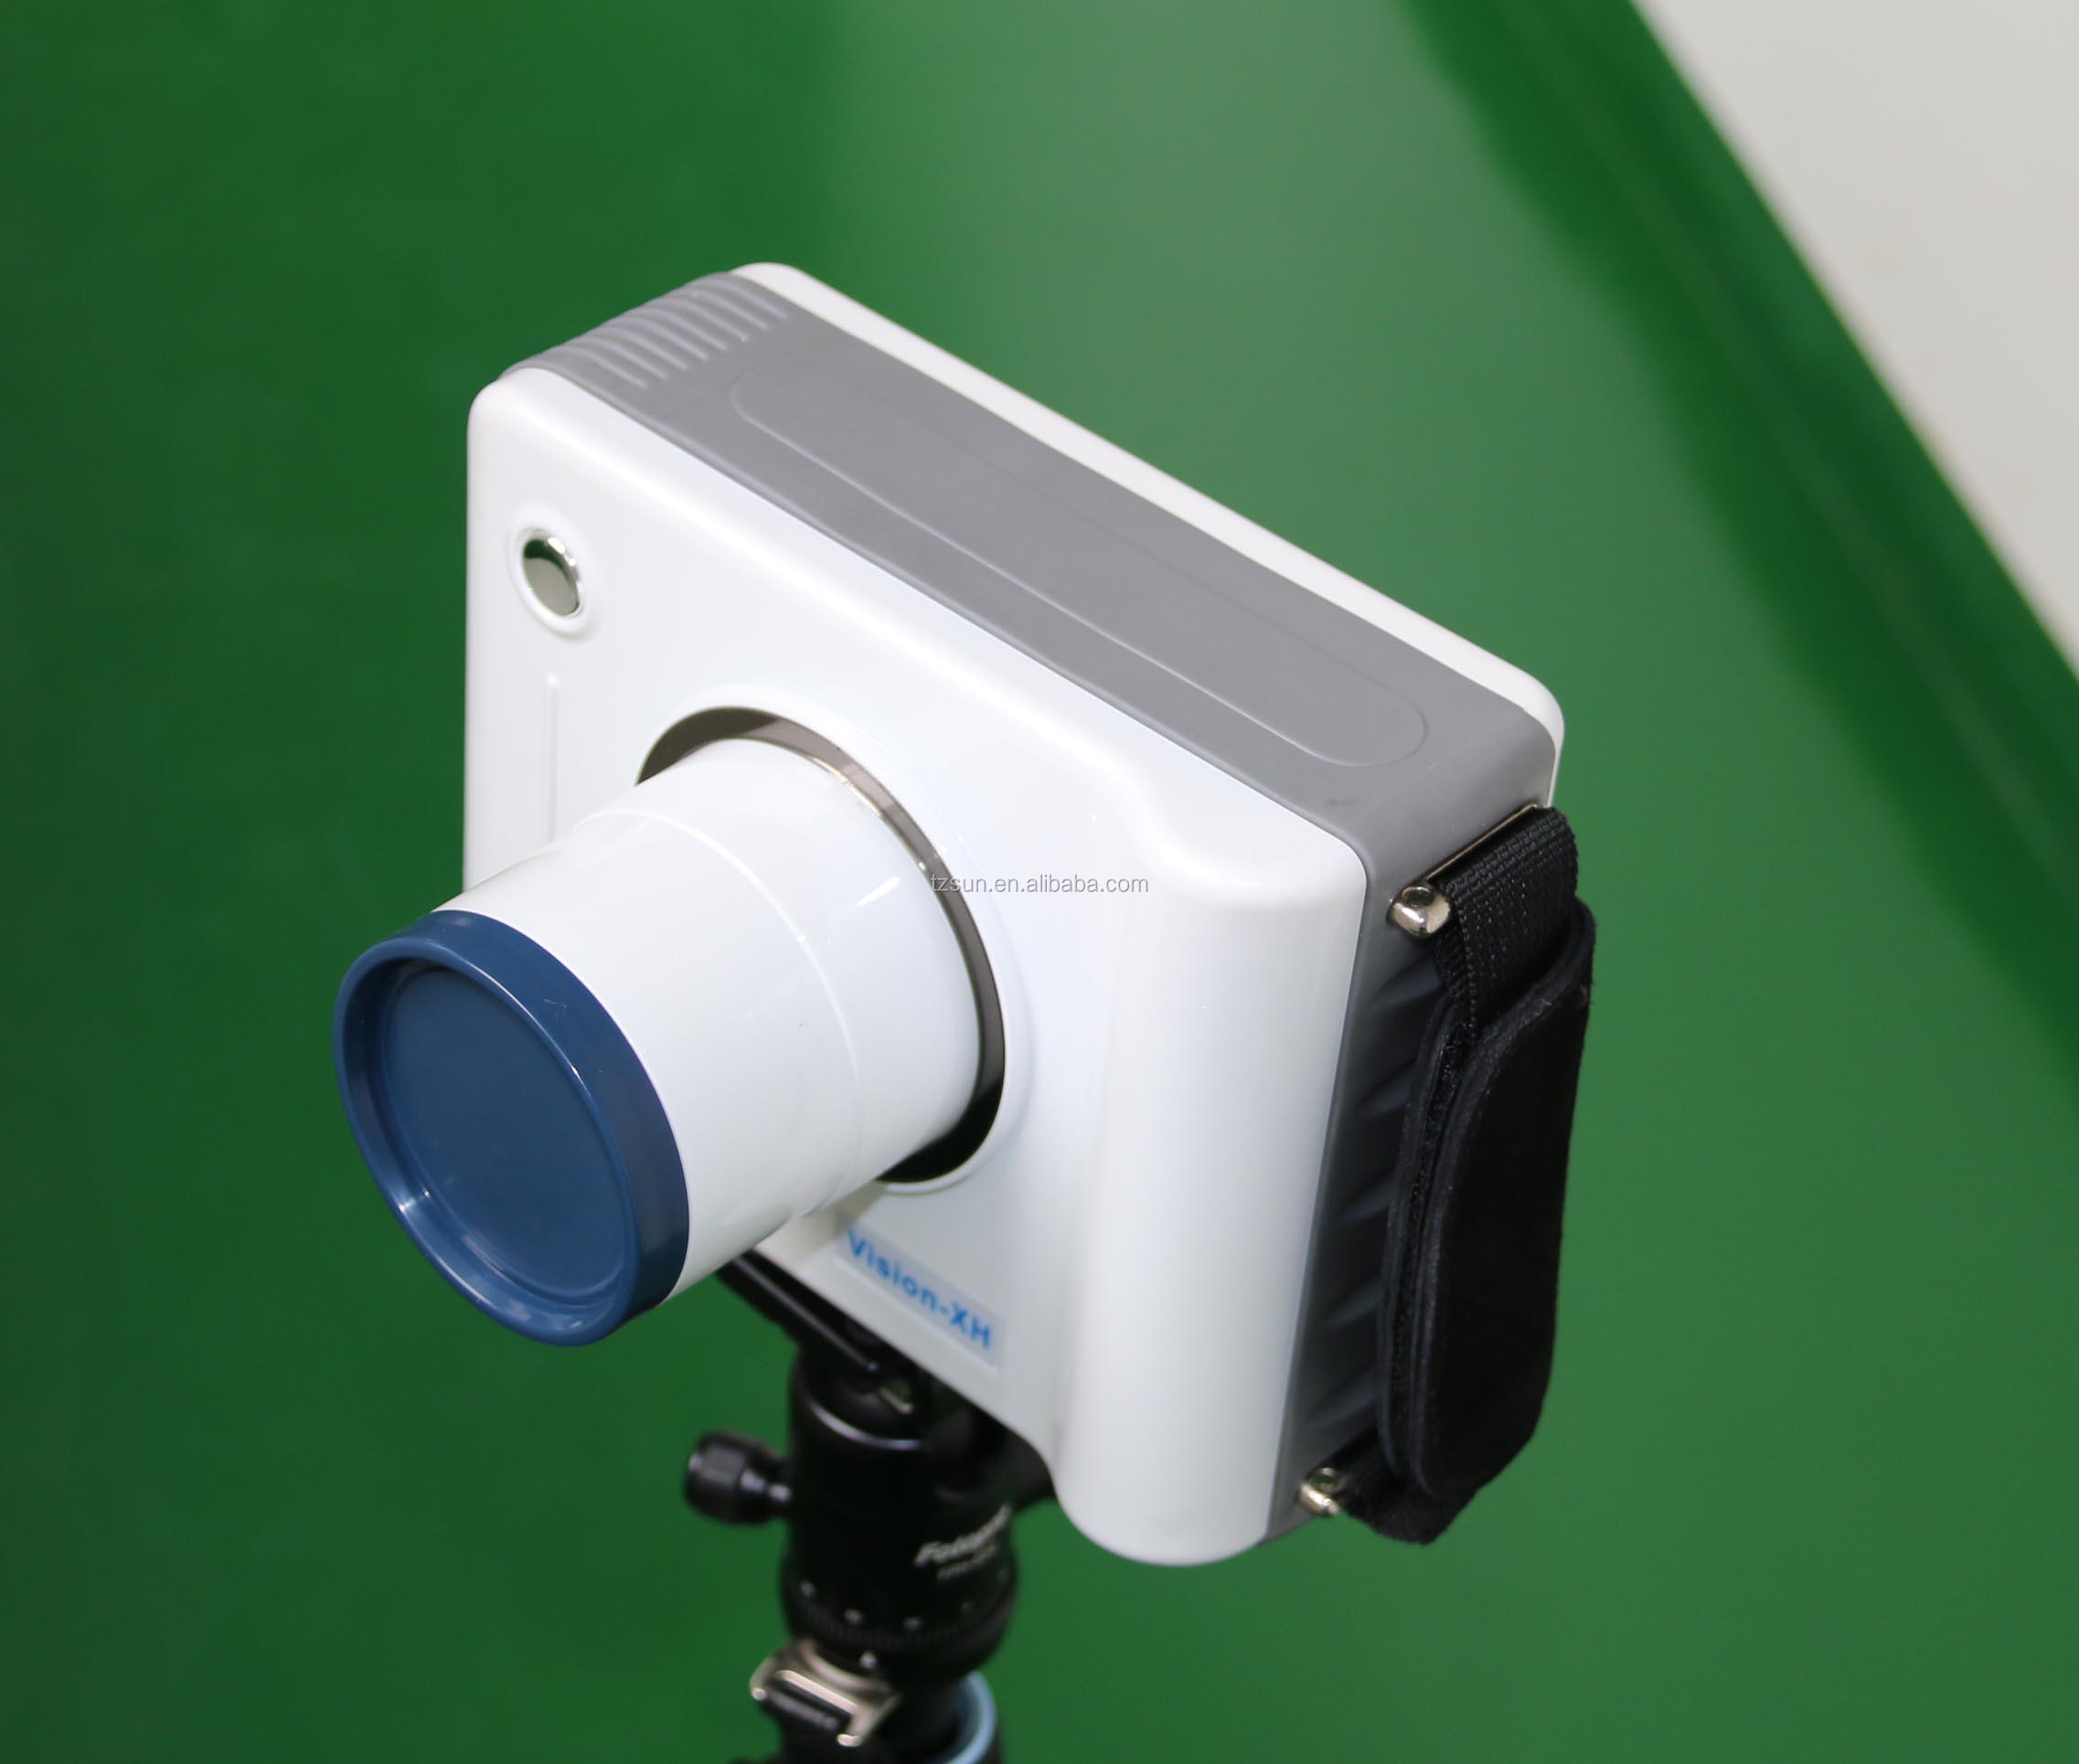 Adx-4000 Kodak Rvg 5100 Digital Dental X-ray - Buy Adx-4000 Dental  X-ray,Kodak Rvg 5100 Digital Dental X-ray,Dental X-ray Product on  Alibaba com